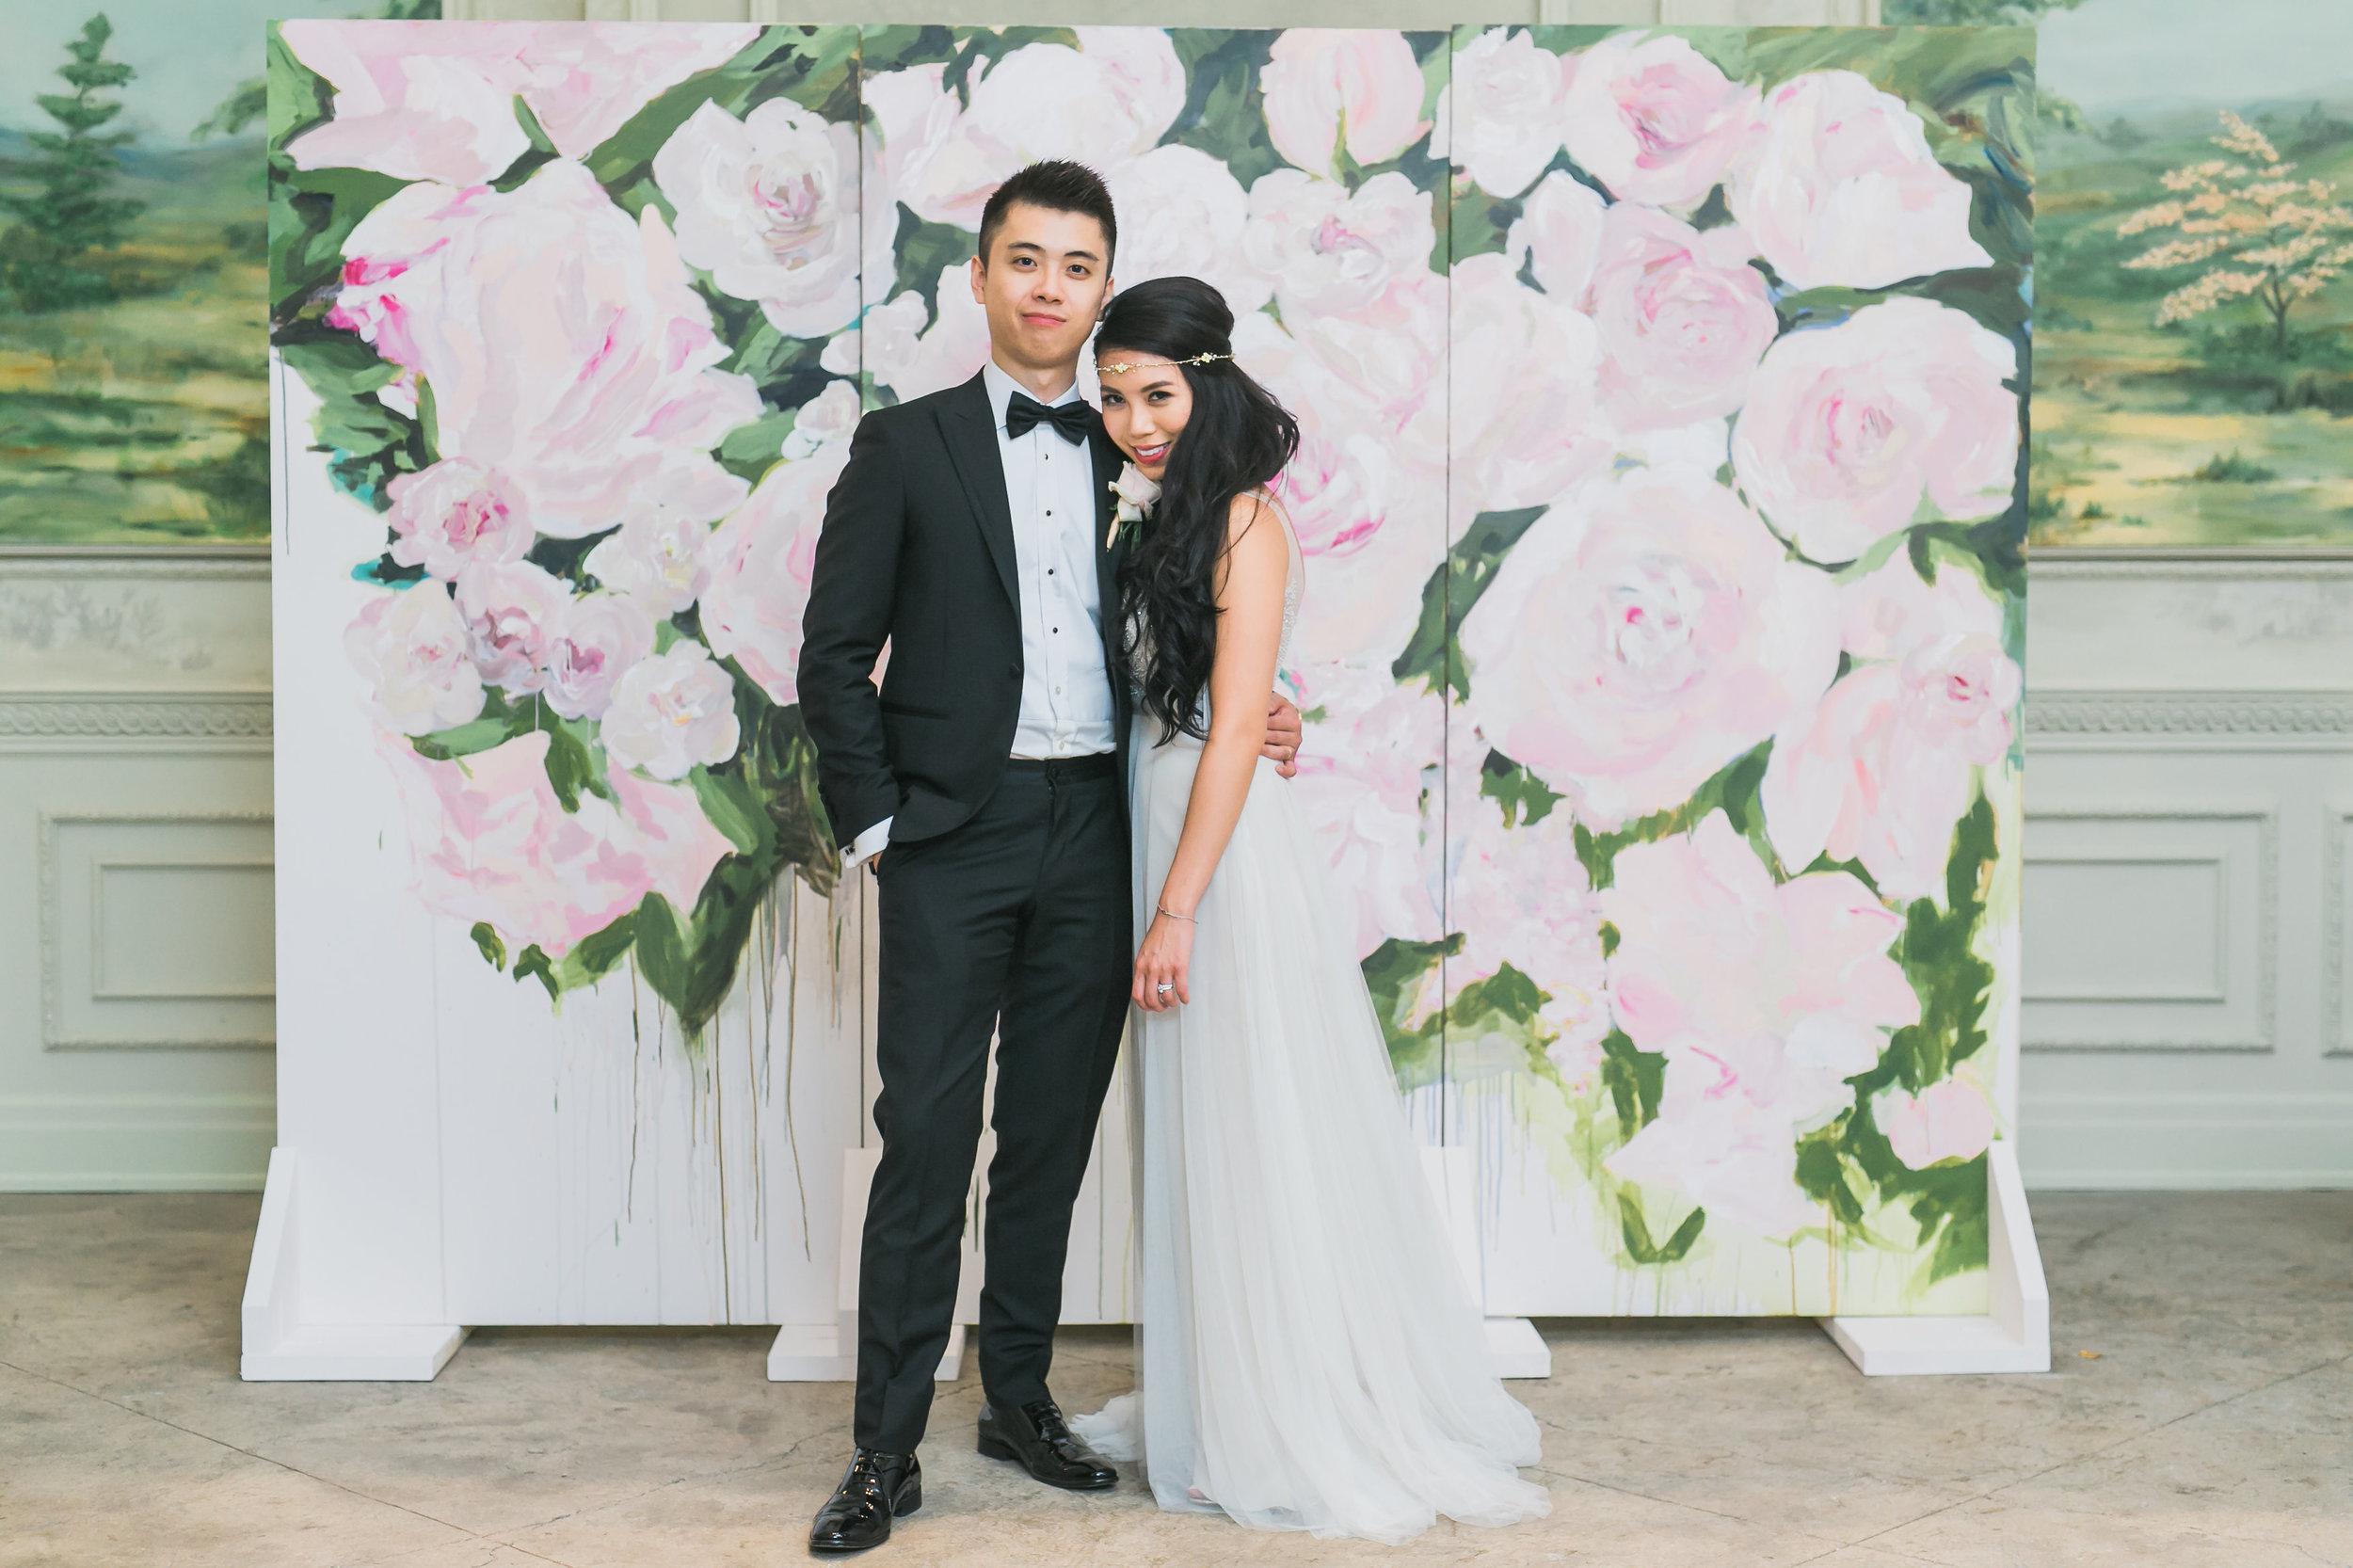 Phoebe Lo Events Toronto Wedding - Graydon Hall Manor Garden Charm Event 035.jpg